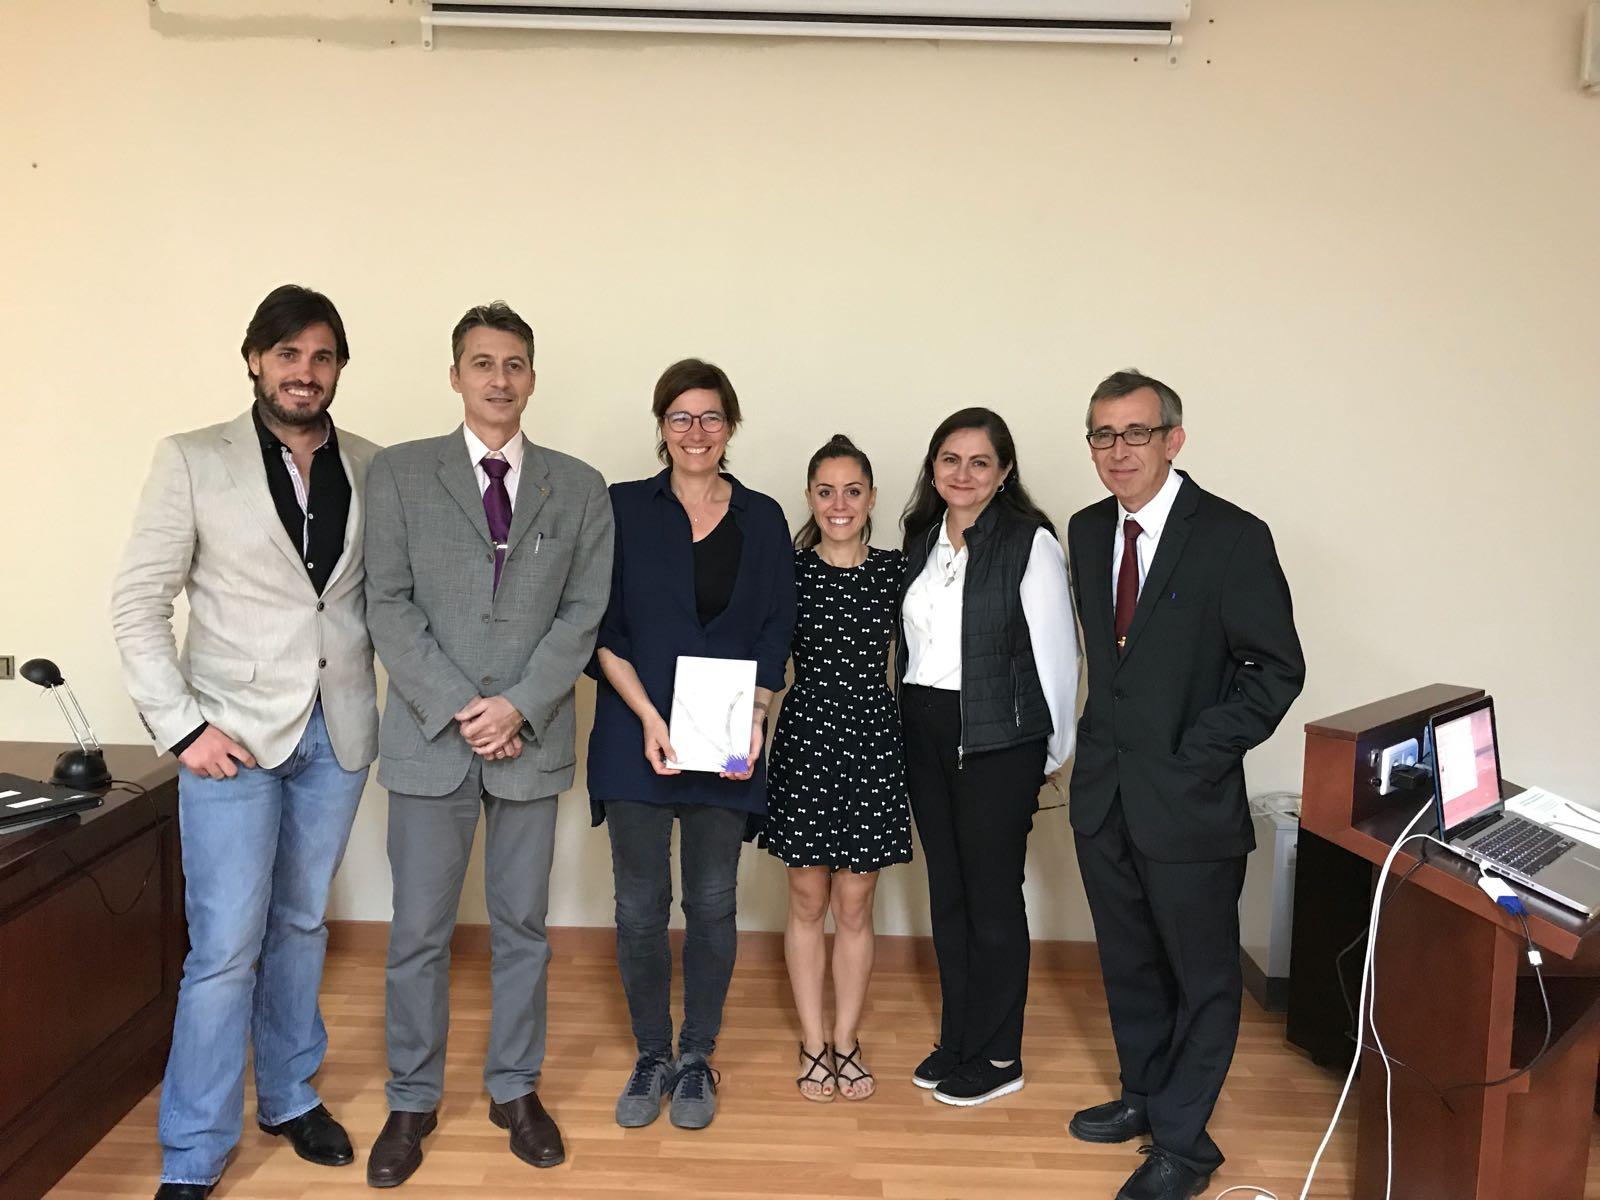 Dr. Brun, Dr. Pérez-Lloréns, Dra. Alcoverro, Dra. Jiménez-Ramos, Dra. Serviere-Zaragoza, Dr. Vergara